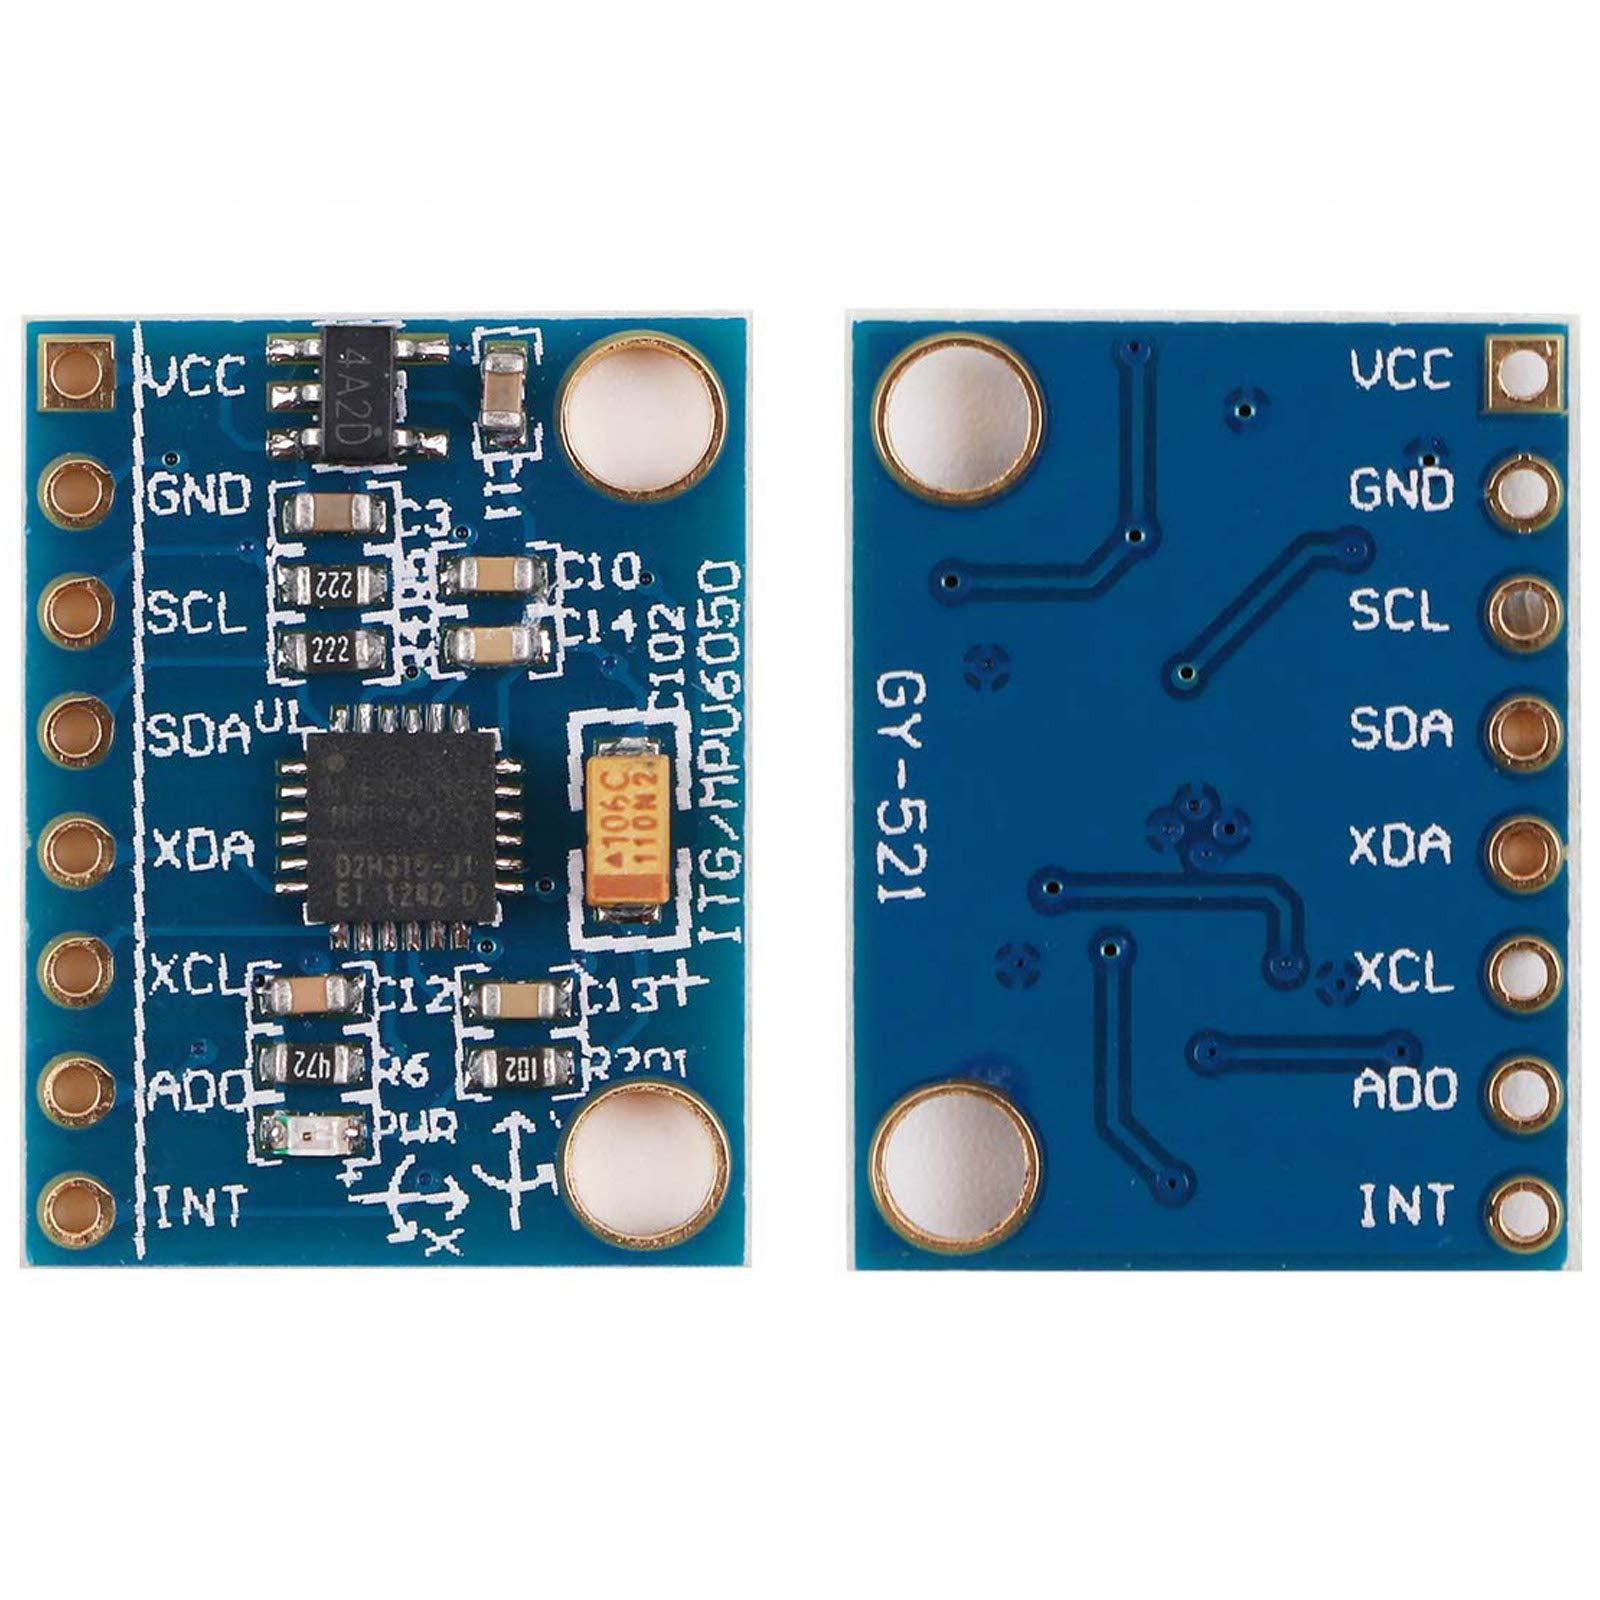 Gy-521 MPU-6050 MPU6050 Module 3 Axis Analog Gyro Sensors+ 3 Axis Accelerometer Module by Generic (Image #8)